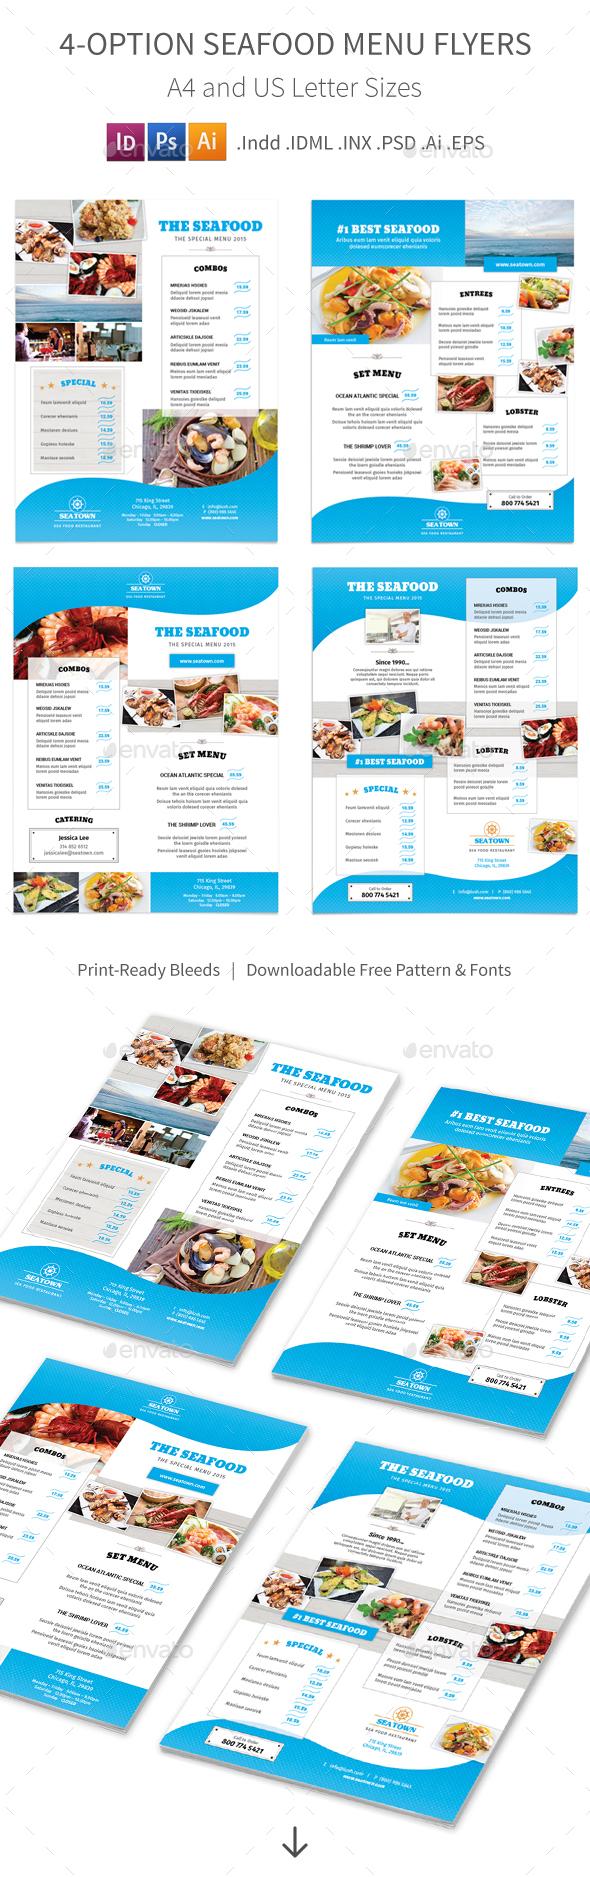 Seafood Restaurant Menu Flyers – 4 Options